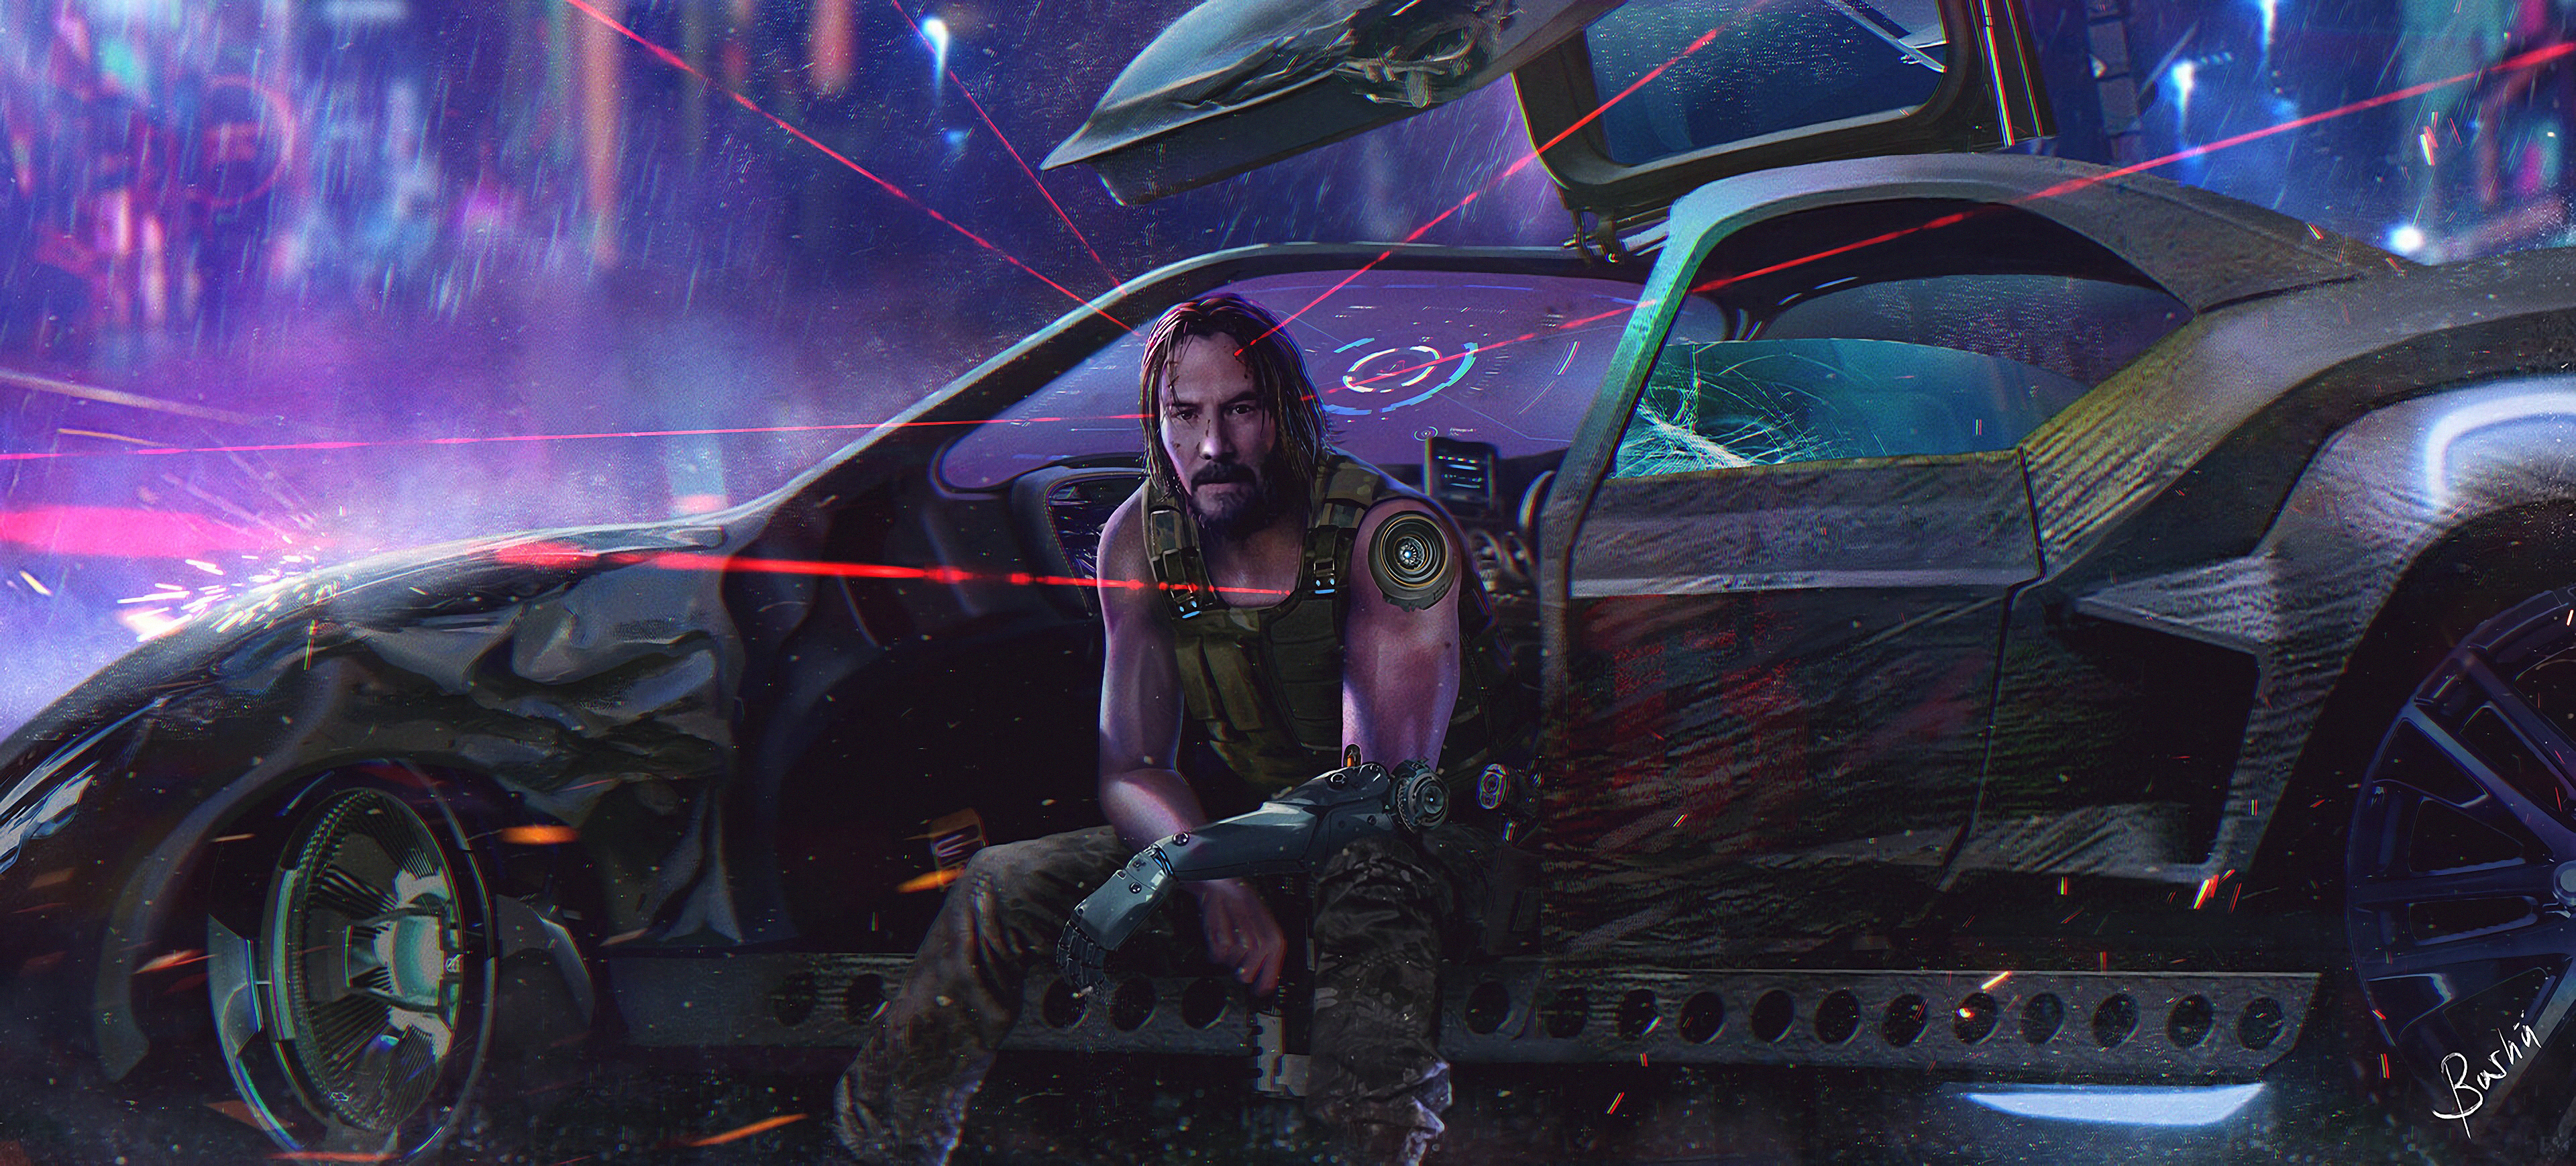 Cyberpunk 2077 HD Wallpaper | Background Image | 3840x1738 ...